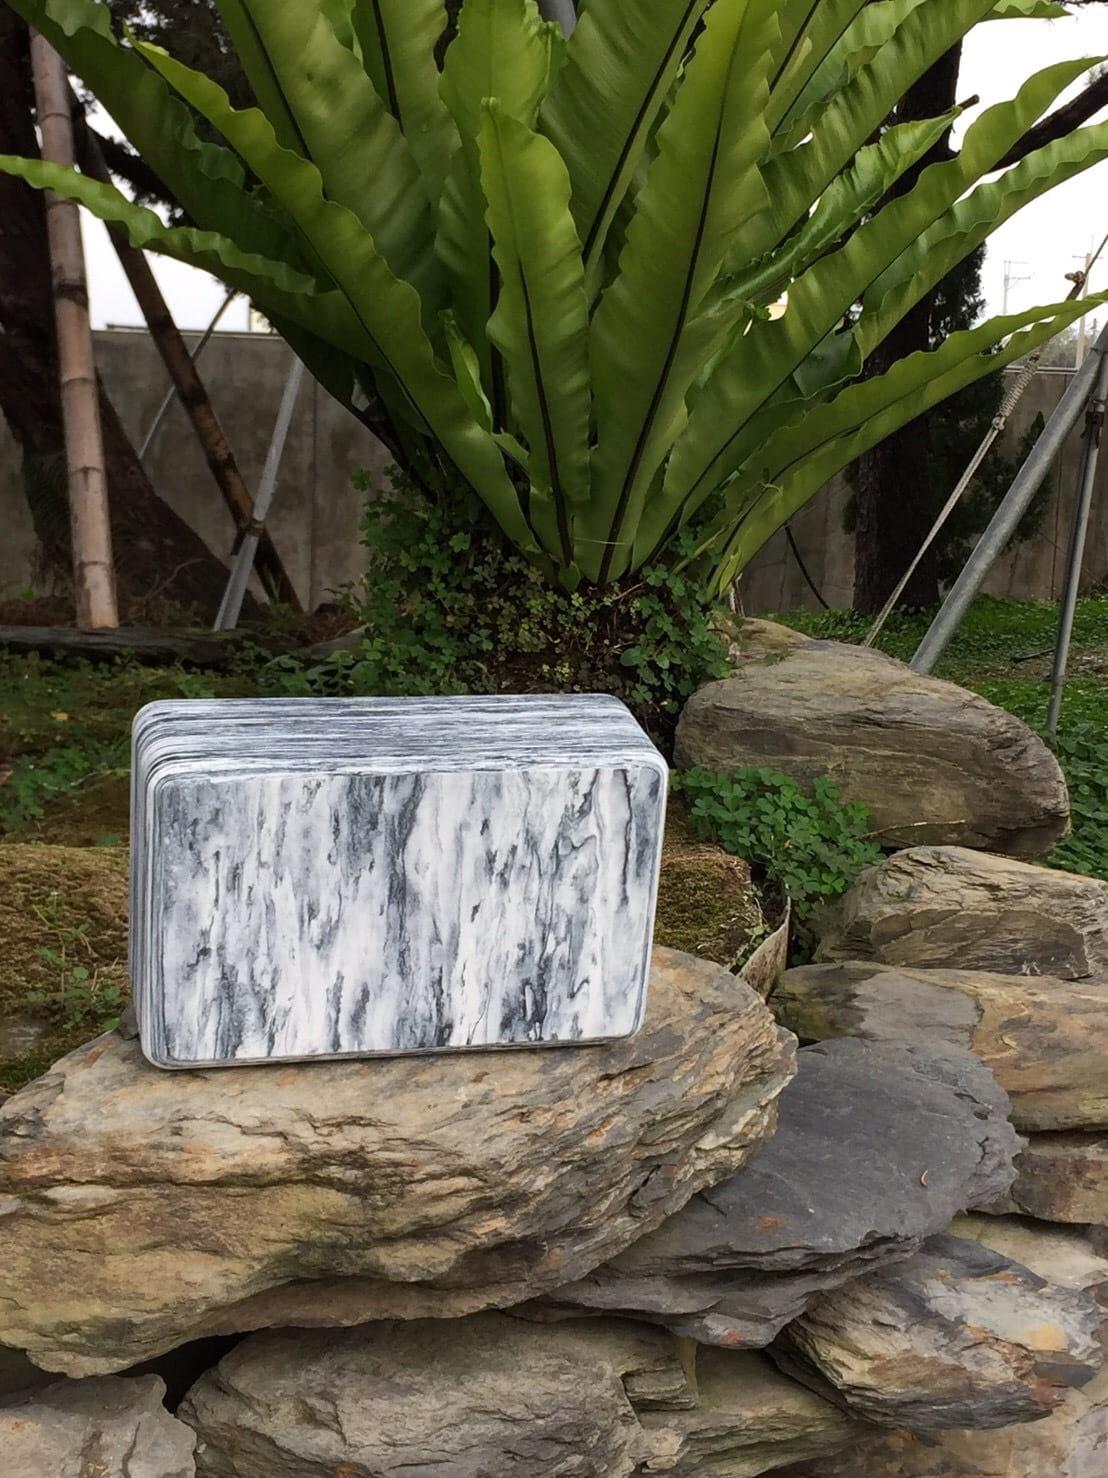 【QMAT】 40D瑜珈磚 混色系-青銅石紋、黑白雲彩 1